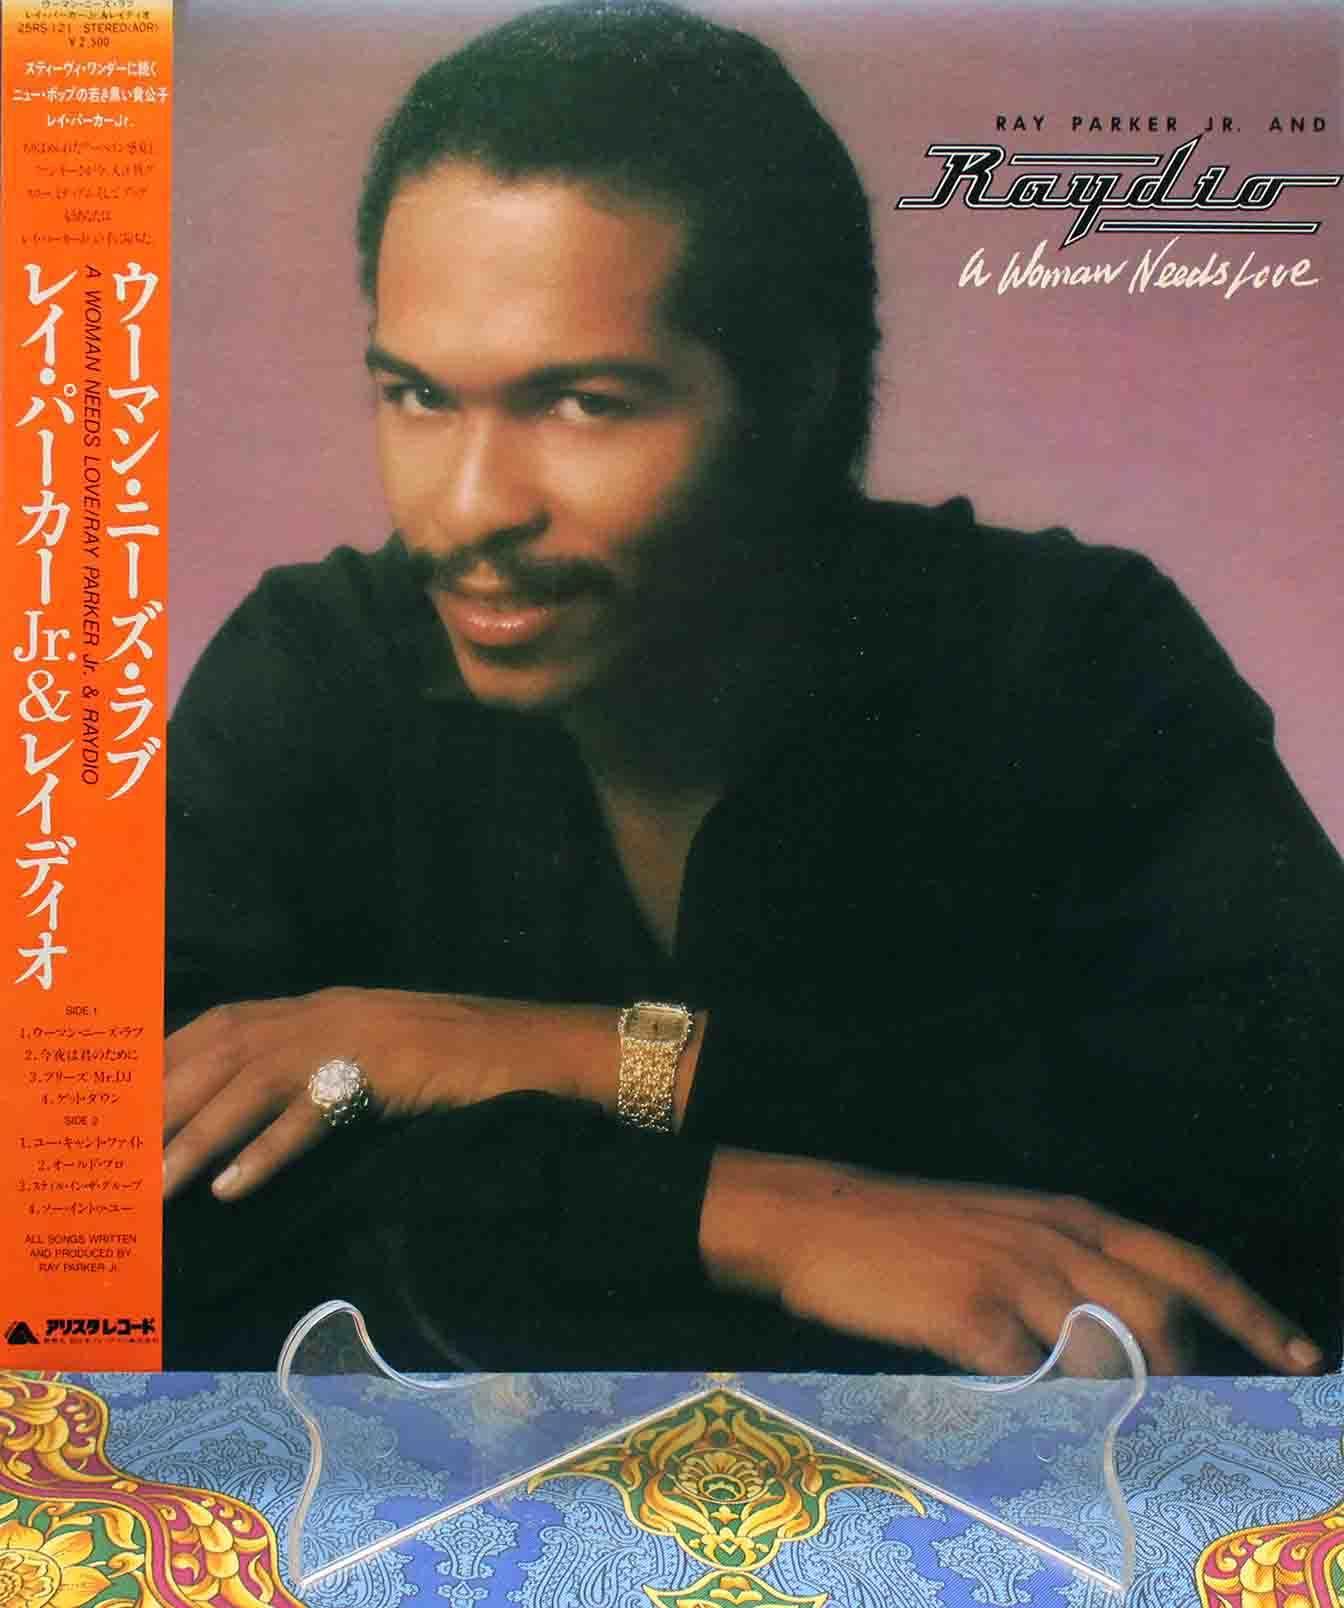 Ray Parker Jr Raydio- Women needs love LP 01